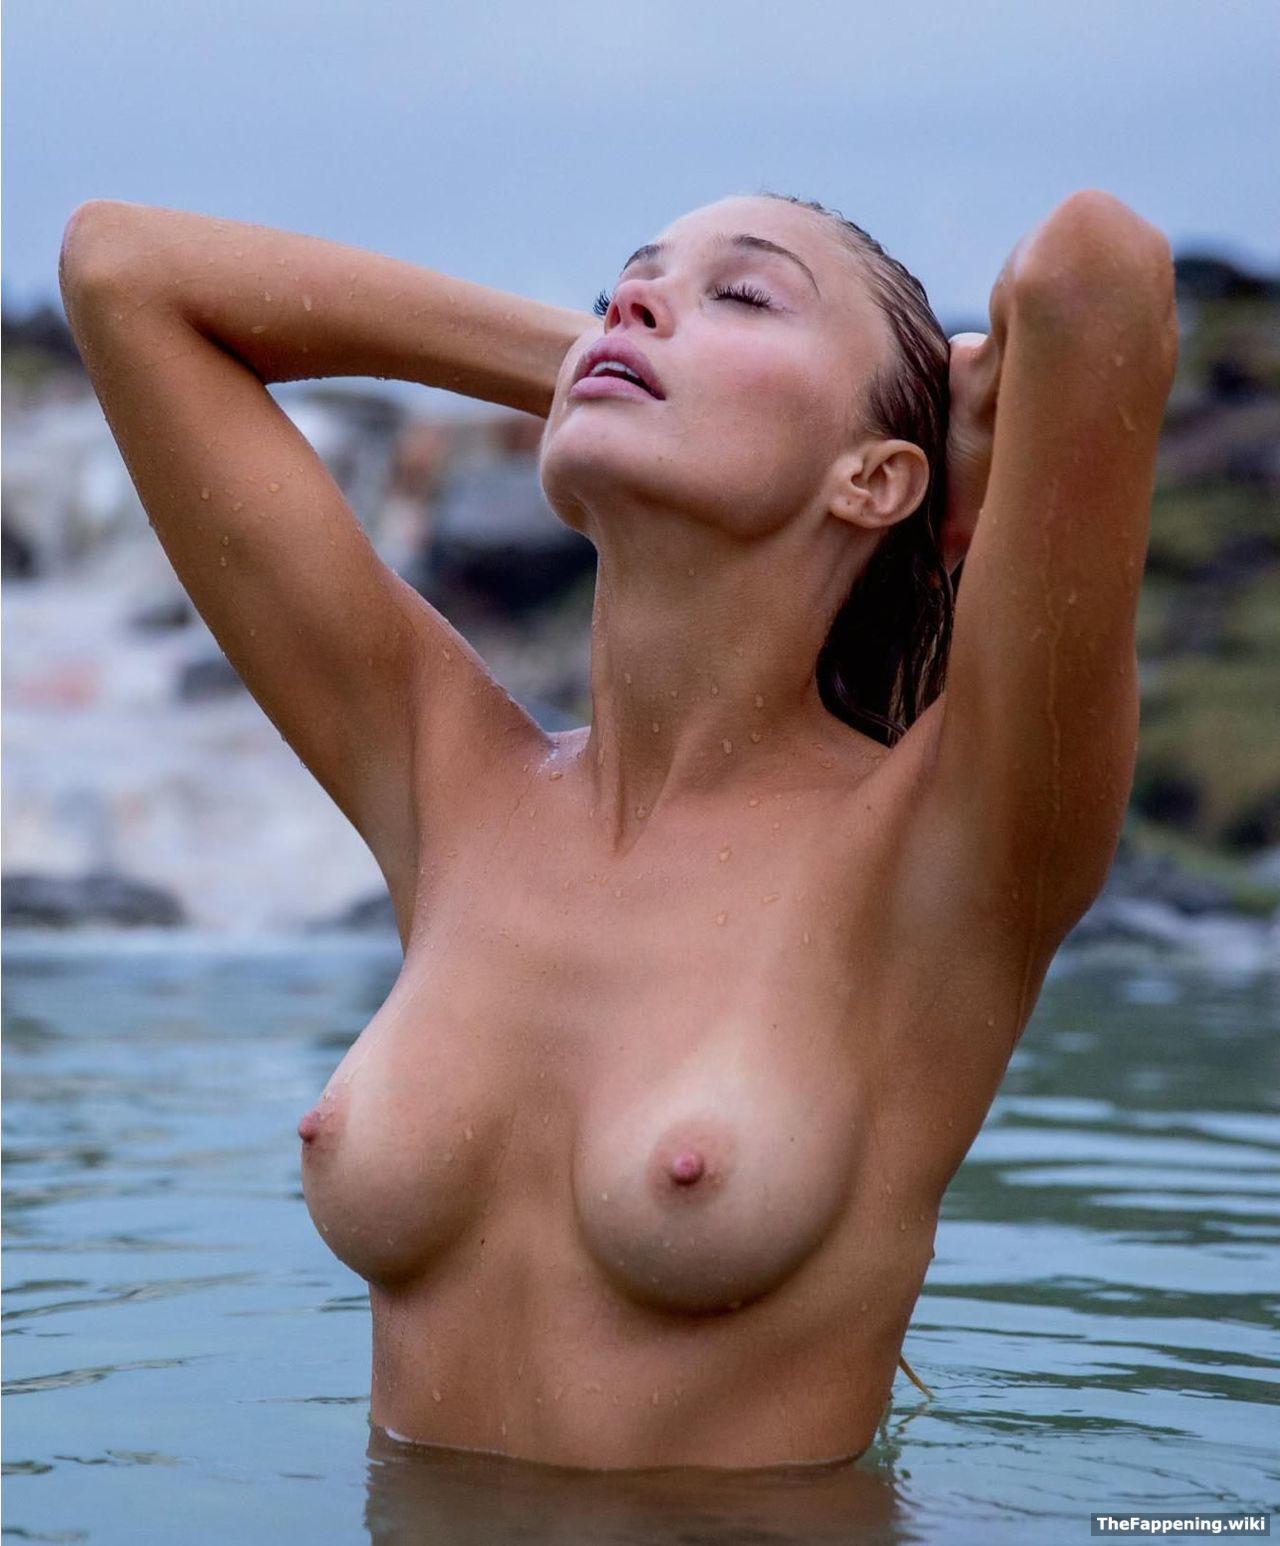 Allie leggett nude pics nude (57 images)